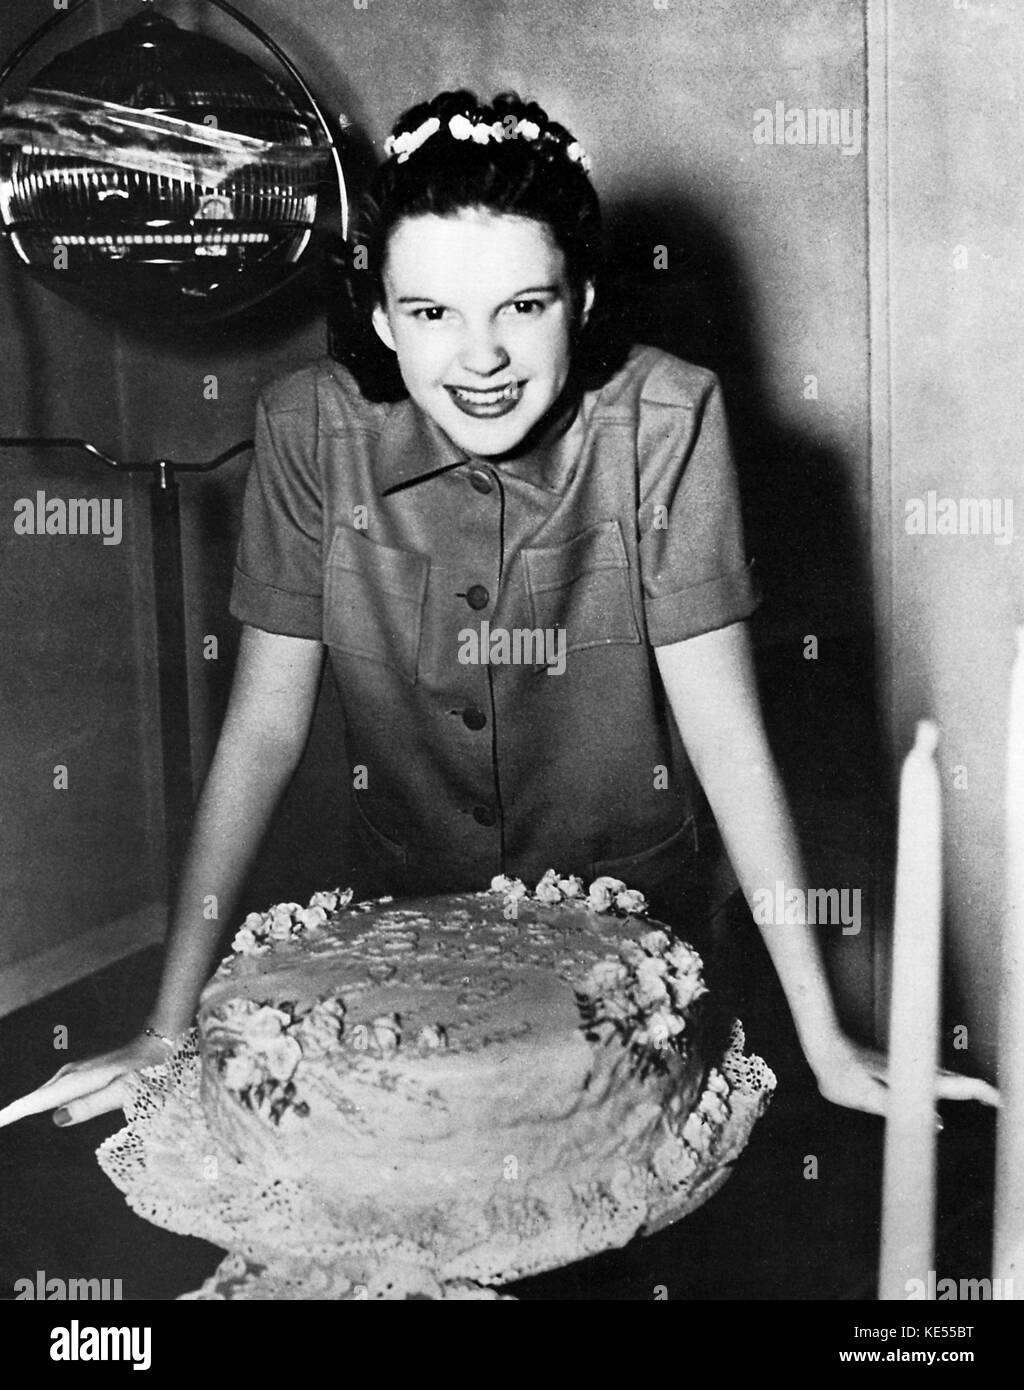 Judy Garland Birthday Cake